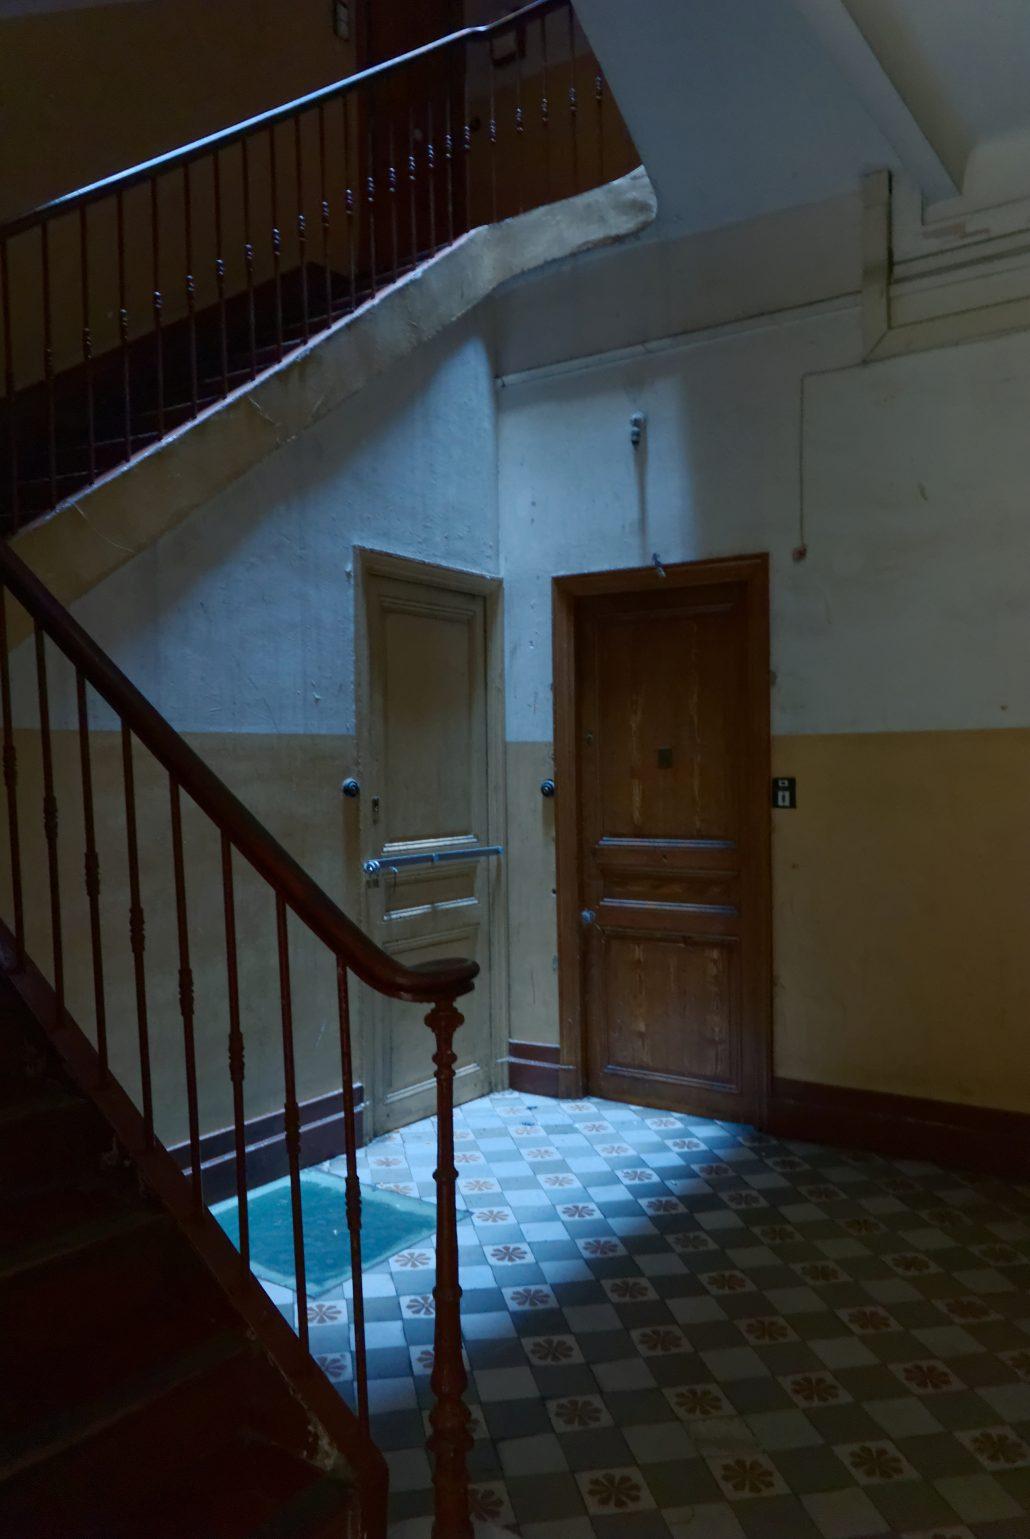 Exits of light